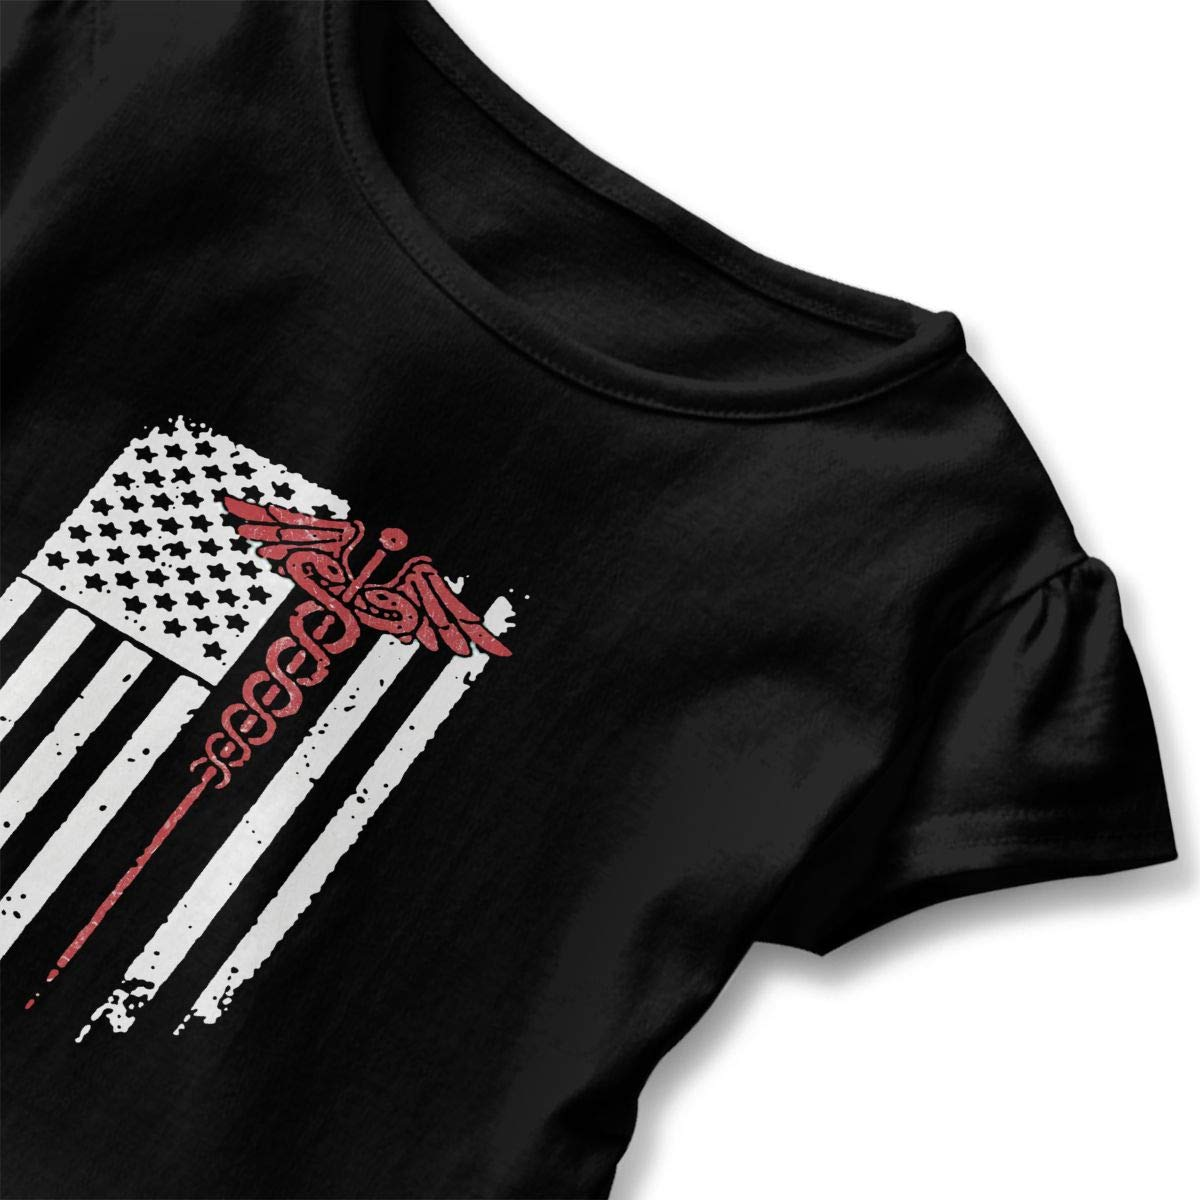 Cheng Jian Bo Nurse USA American Flag Toddler Girls T Shirt Kids Cotton Short Sleeve Ruffle Tee